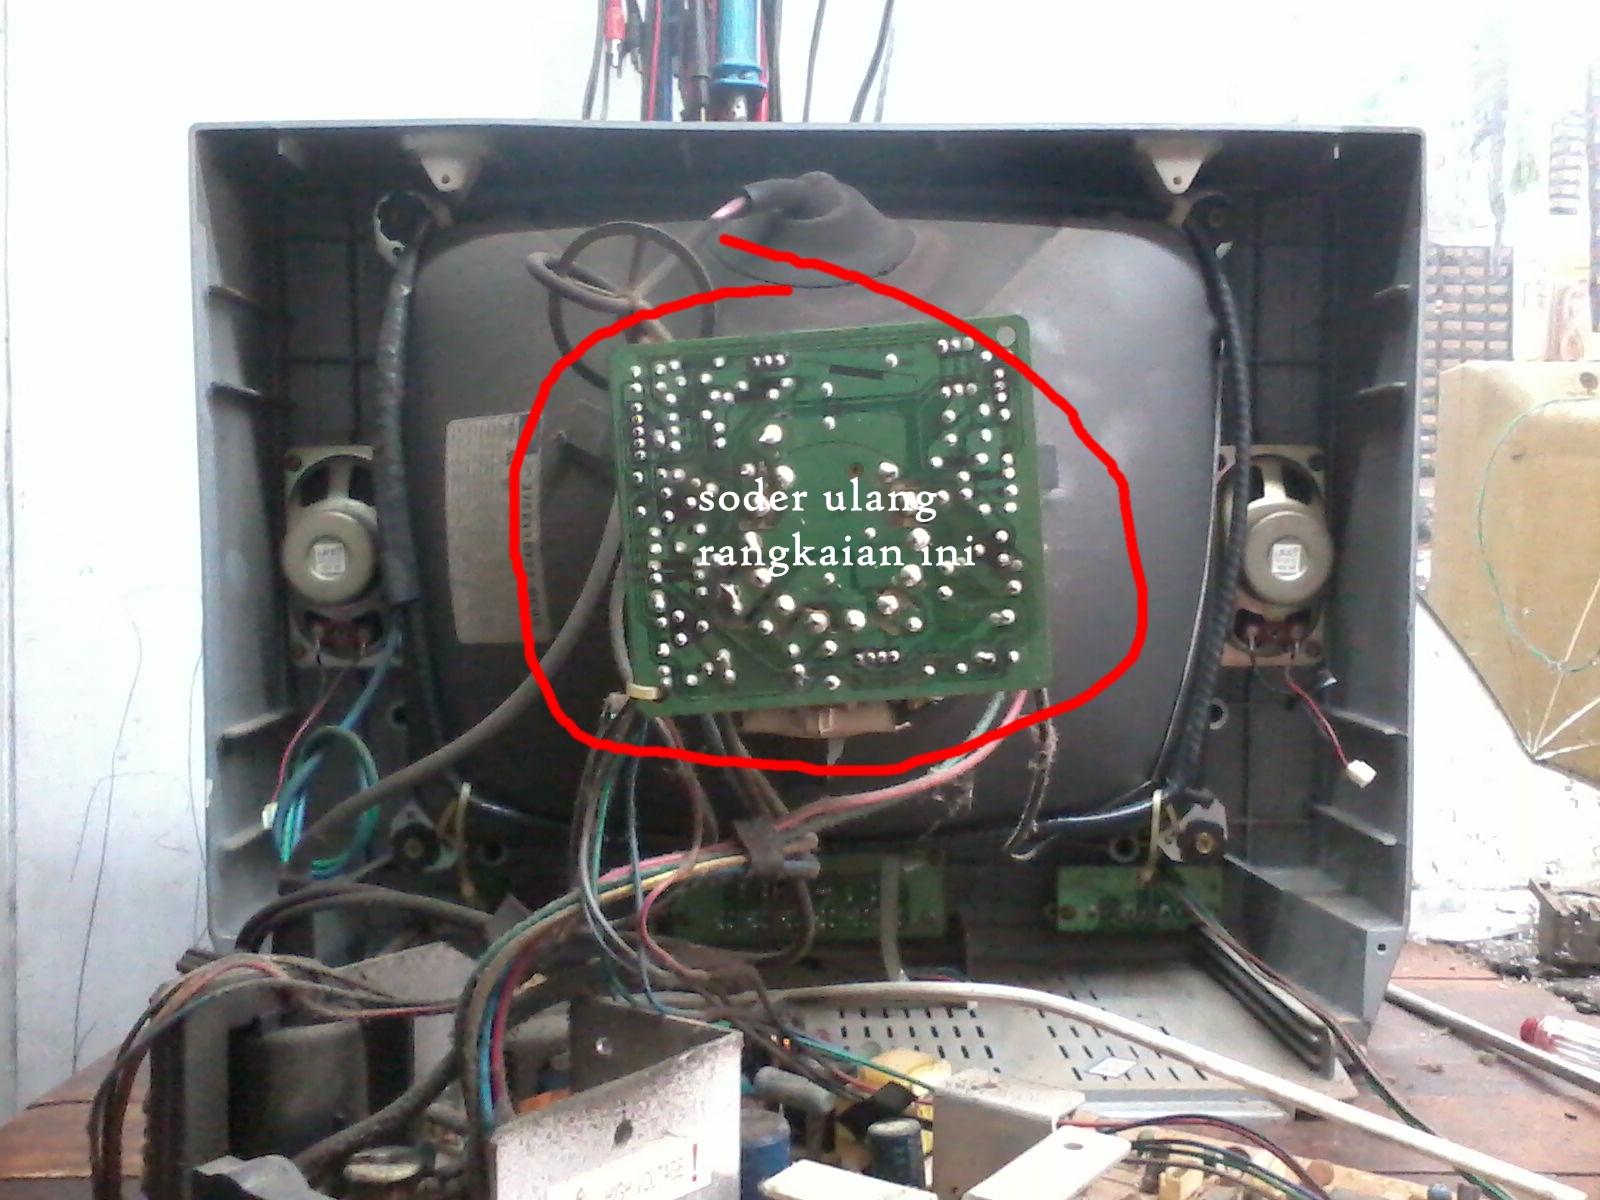 panasonic crt tv. solder ulang rangkaian r,g,b ini panasonic crt tv